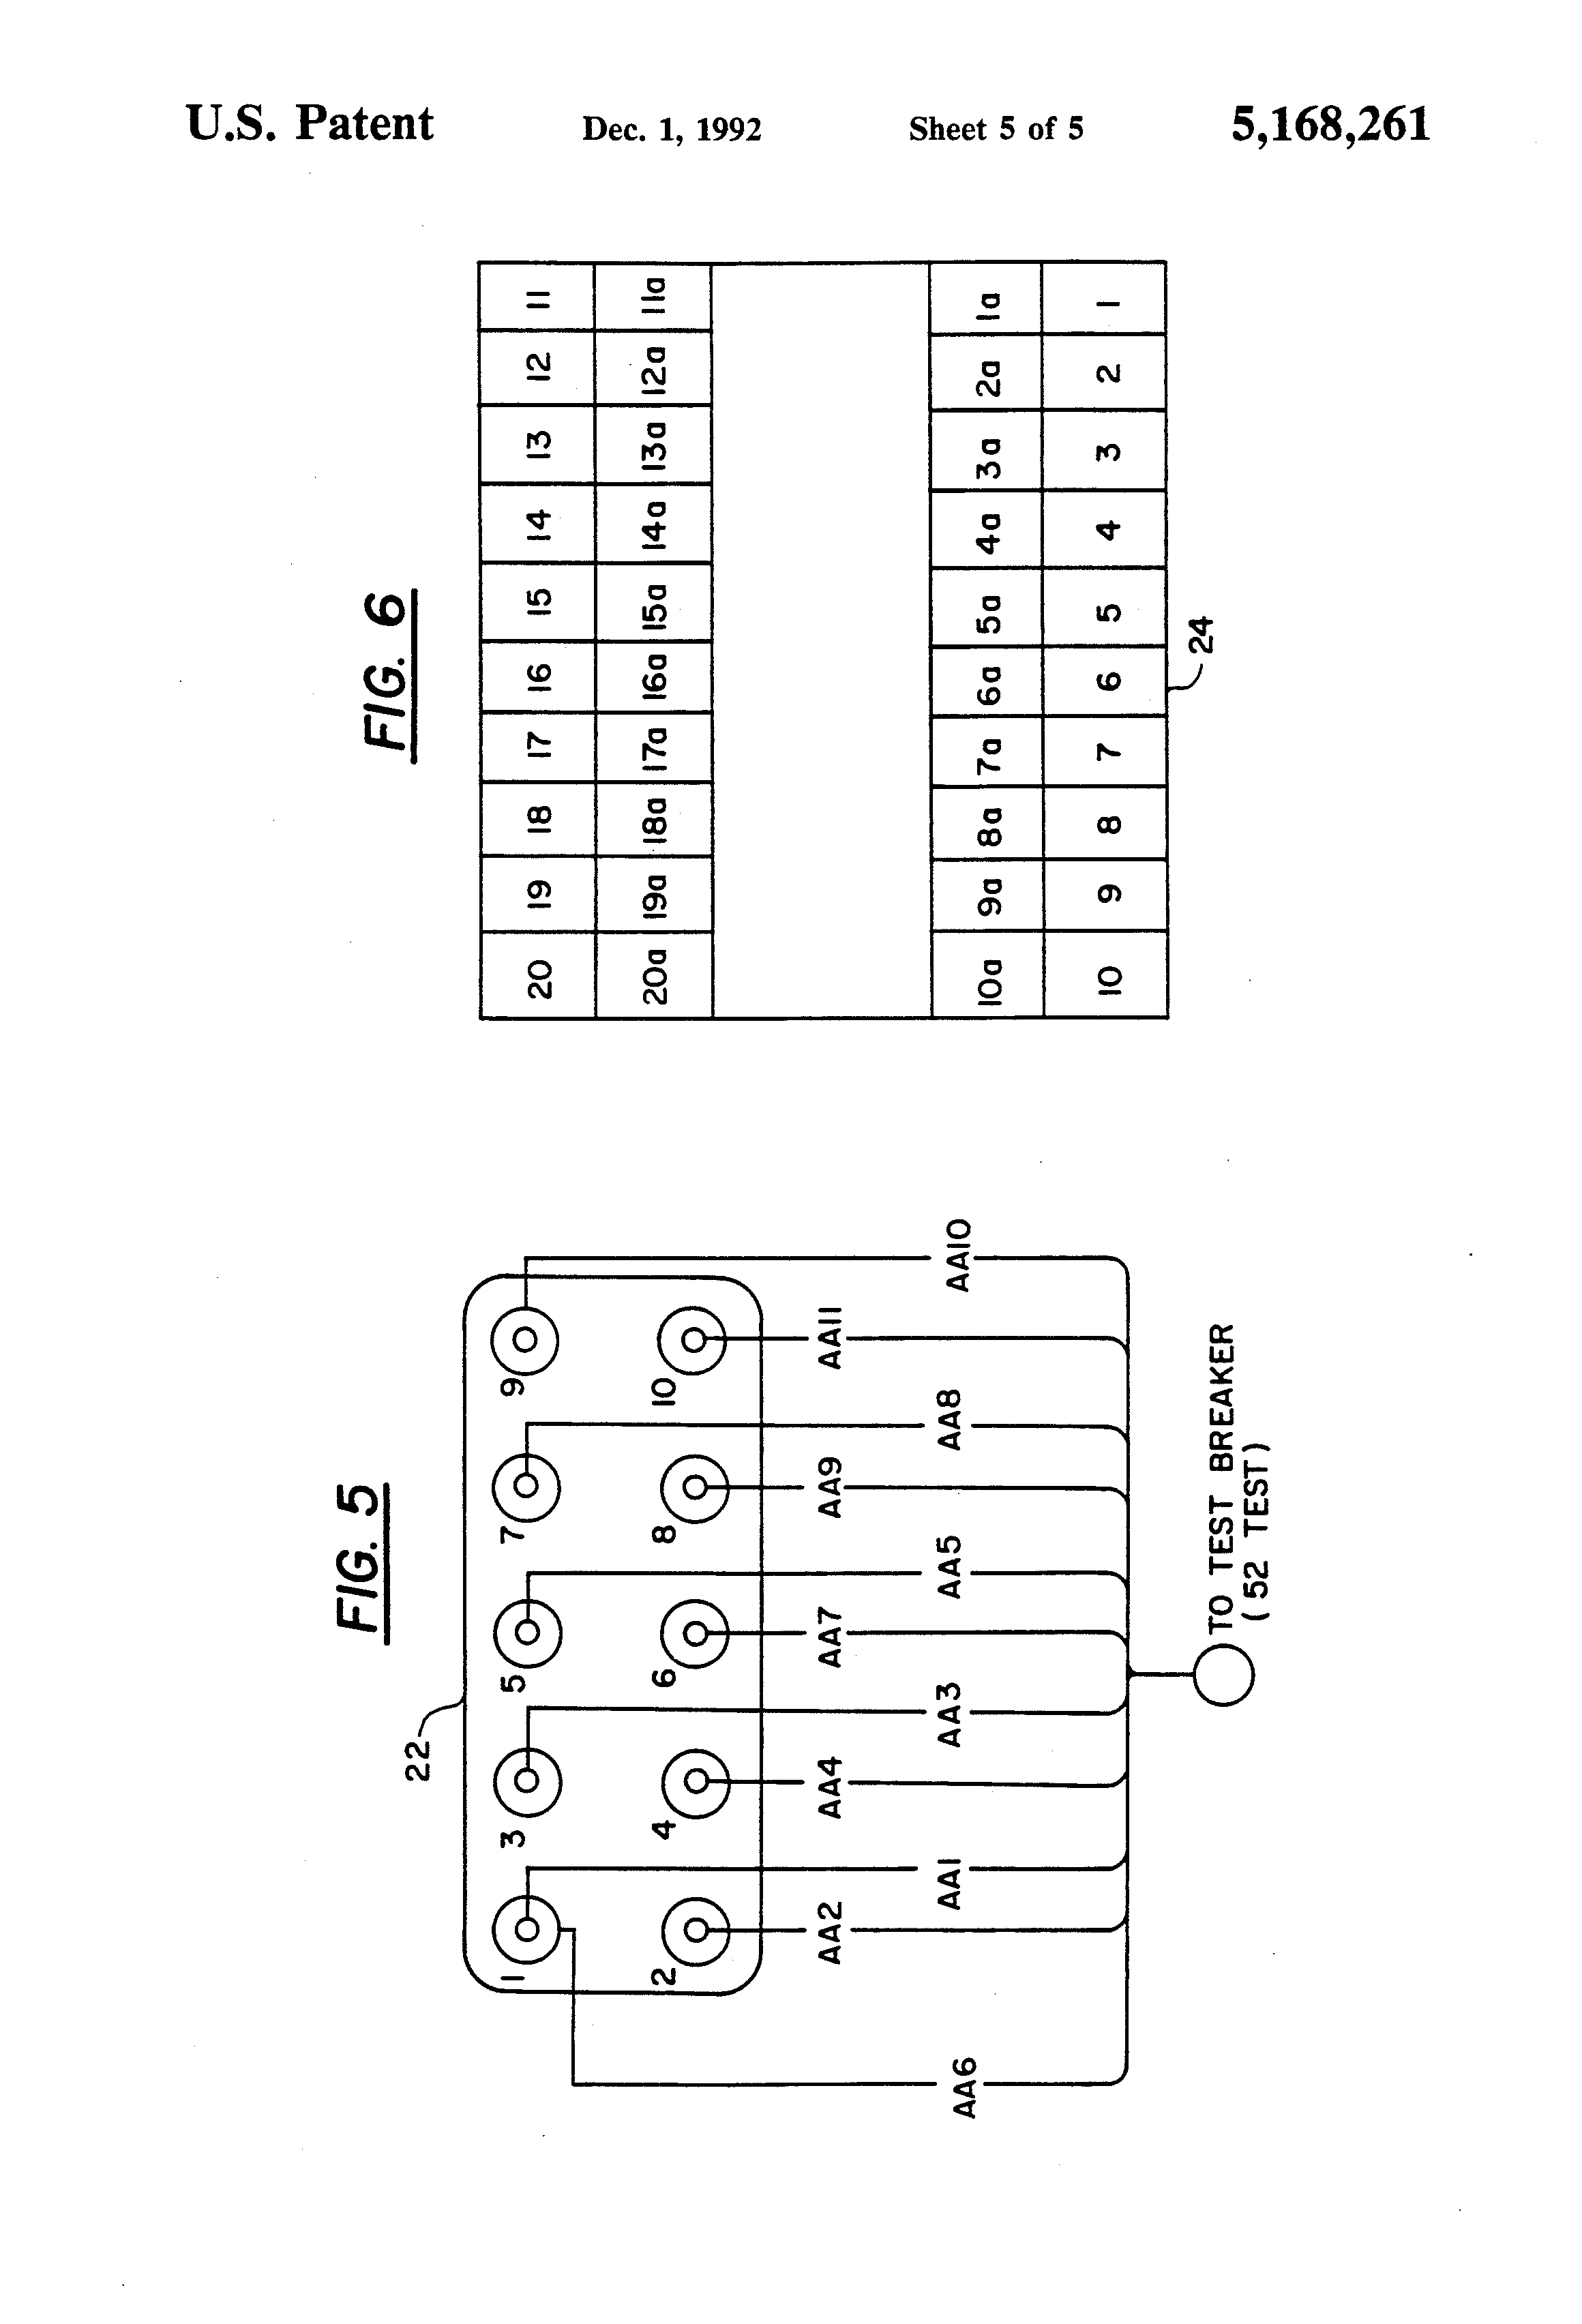 lockout relay wiring imipo rep mannheim de \u2022 86 Lockout Relay PDF lockout relay wiring diagram v relay wiring diagram v wiring rh 8zizithi bresilient co 86 lockout